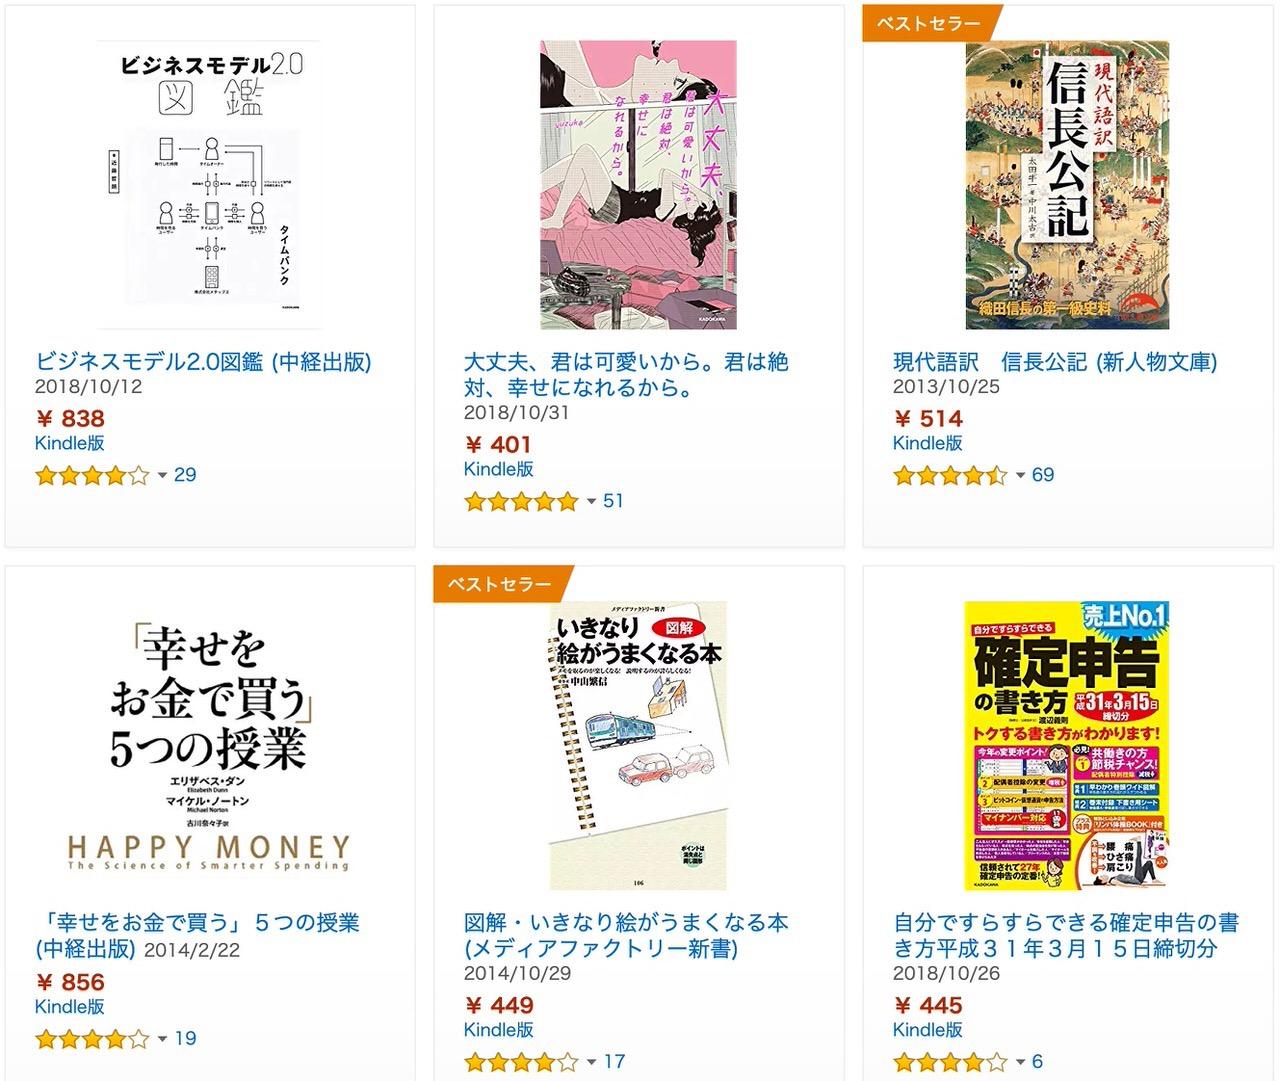 【Kindleセール】「KADOKAWA 春の雑学&実用書フェア」(3/28まで)